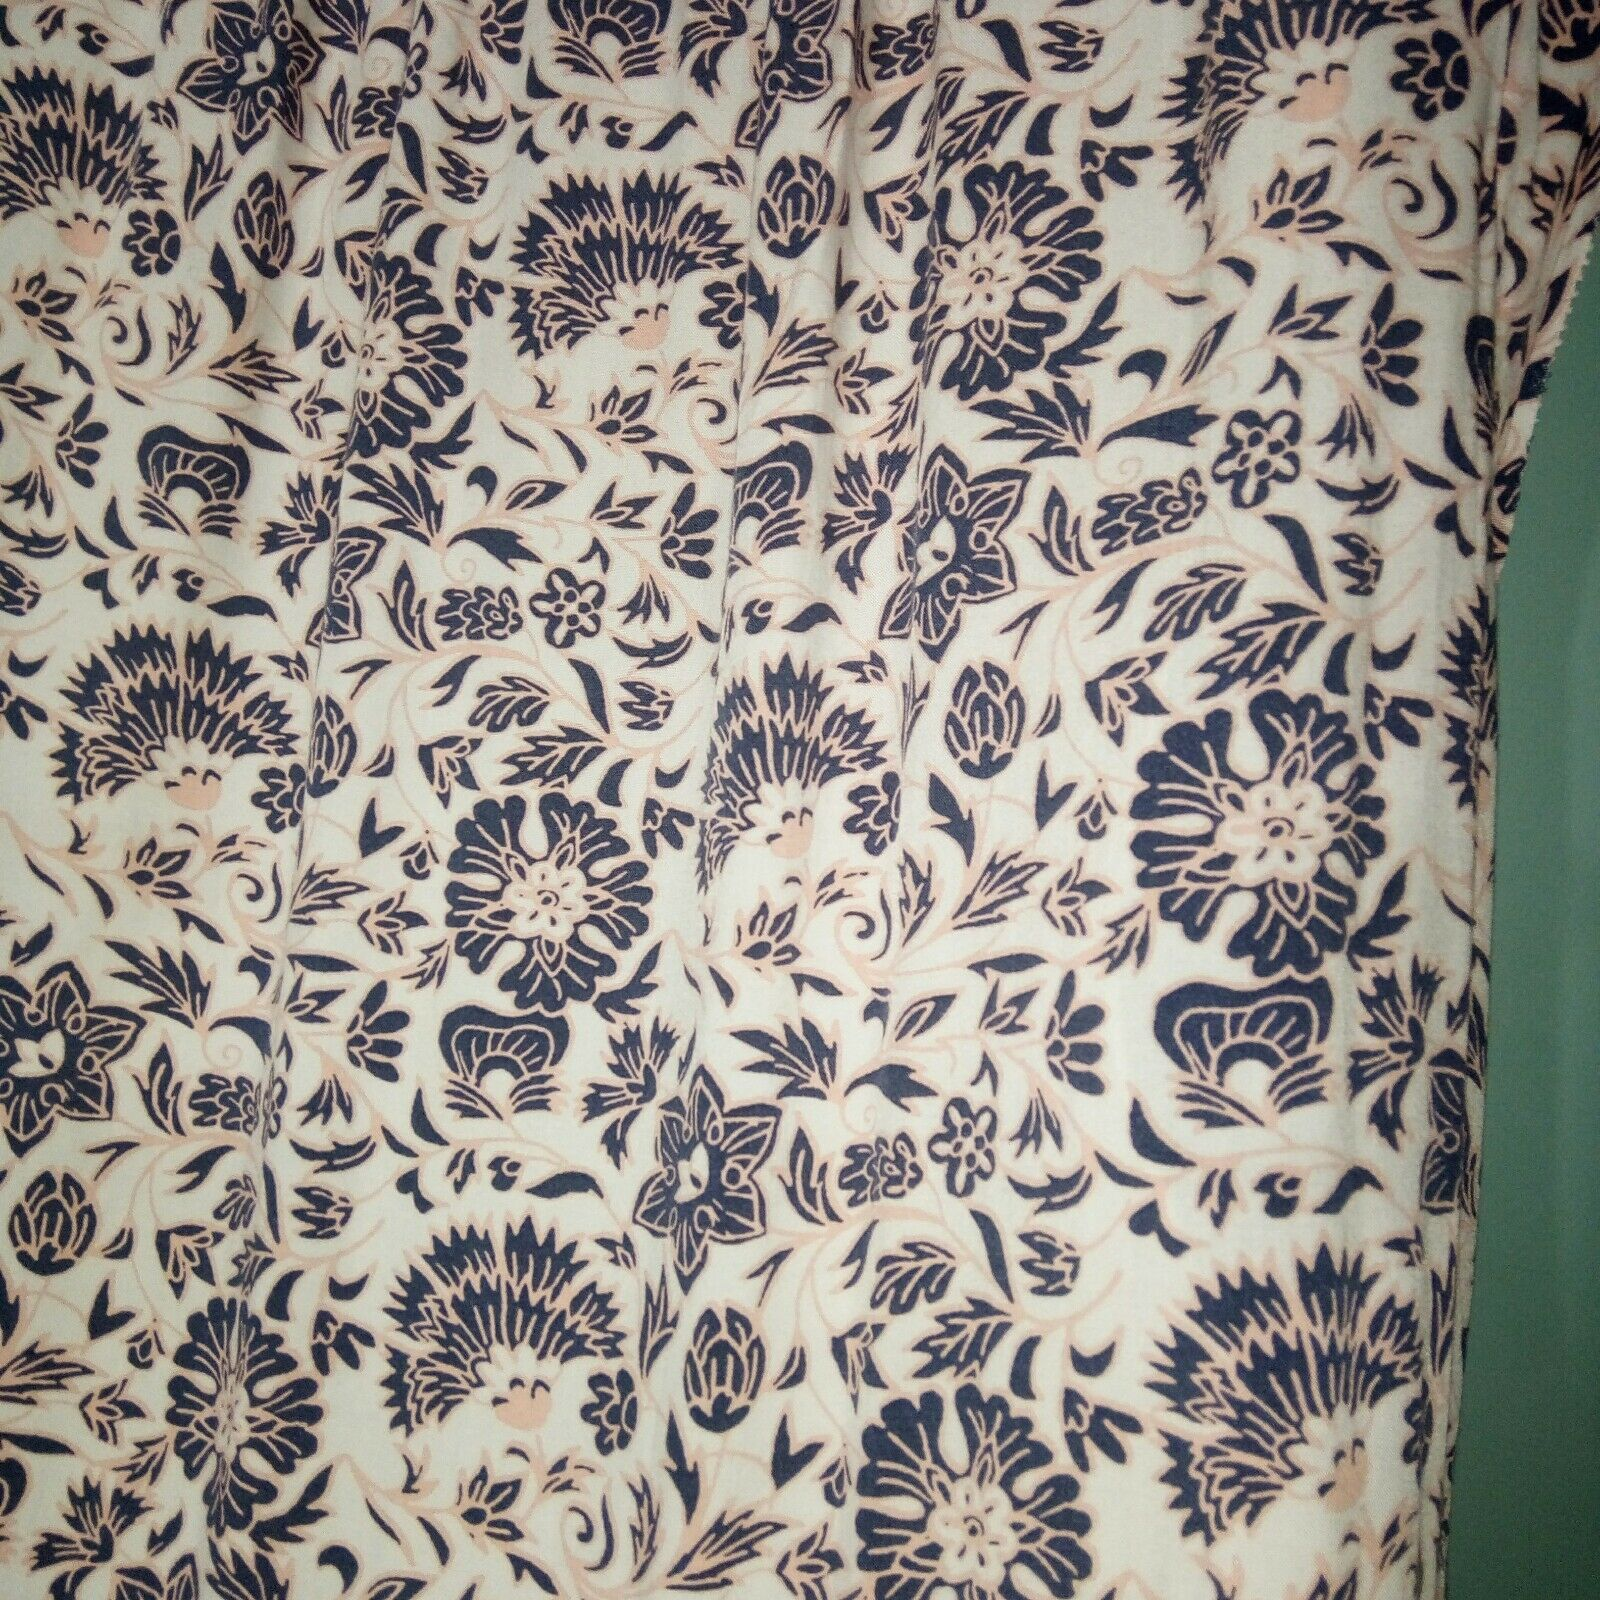 Ann Taylor LOFT Women's Dress Rayon  Floral Button Front Short Sleeve Size M